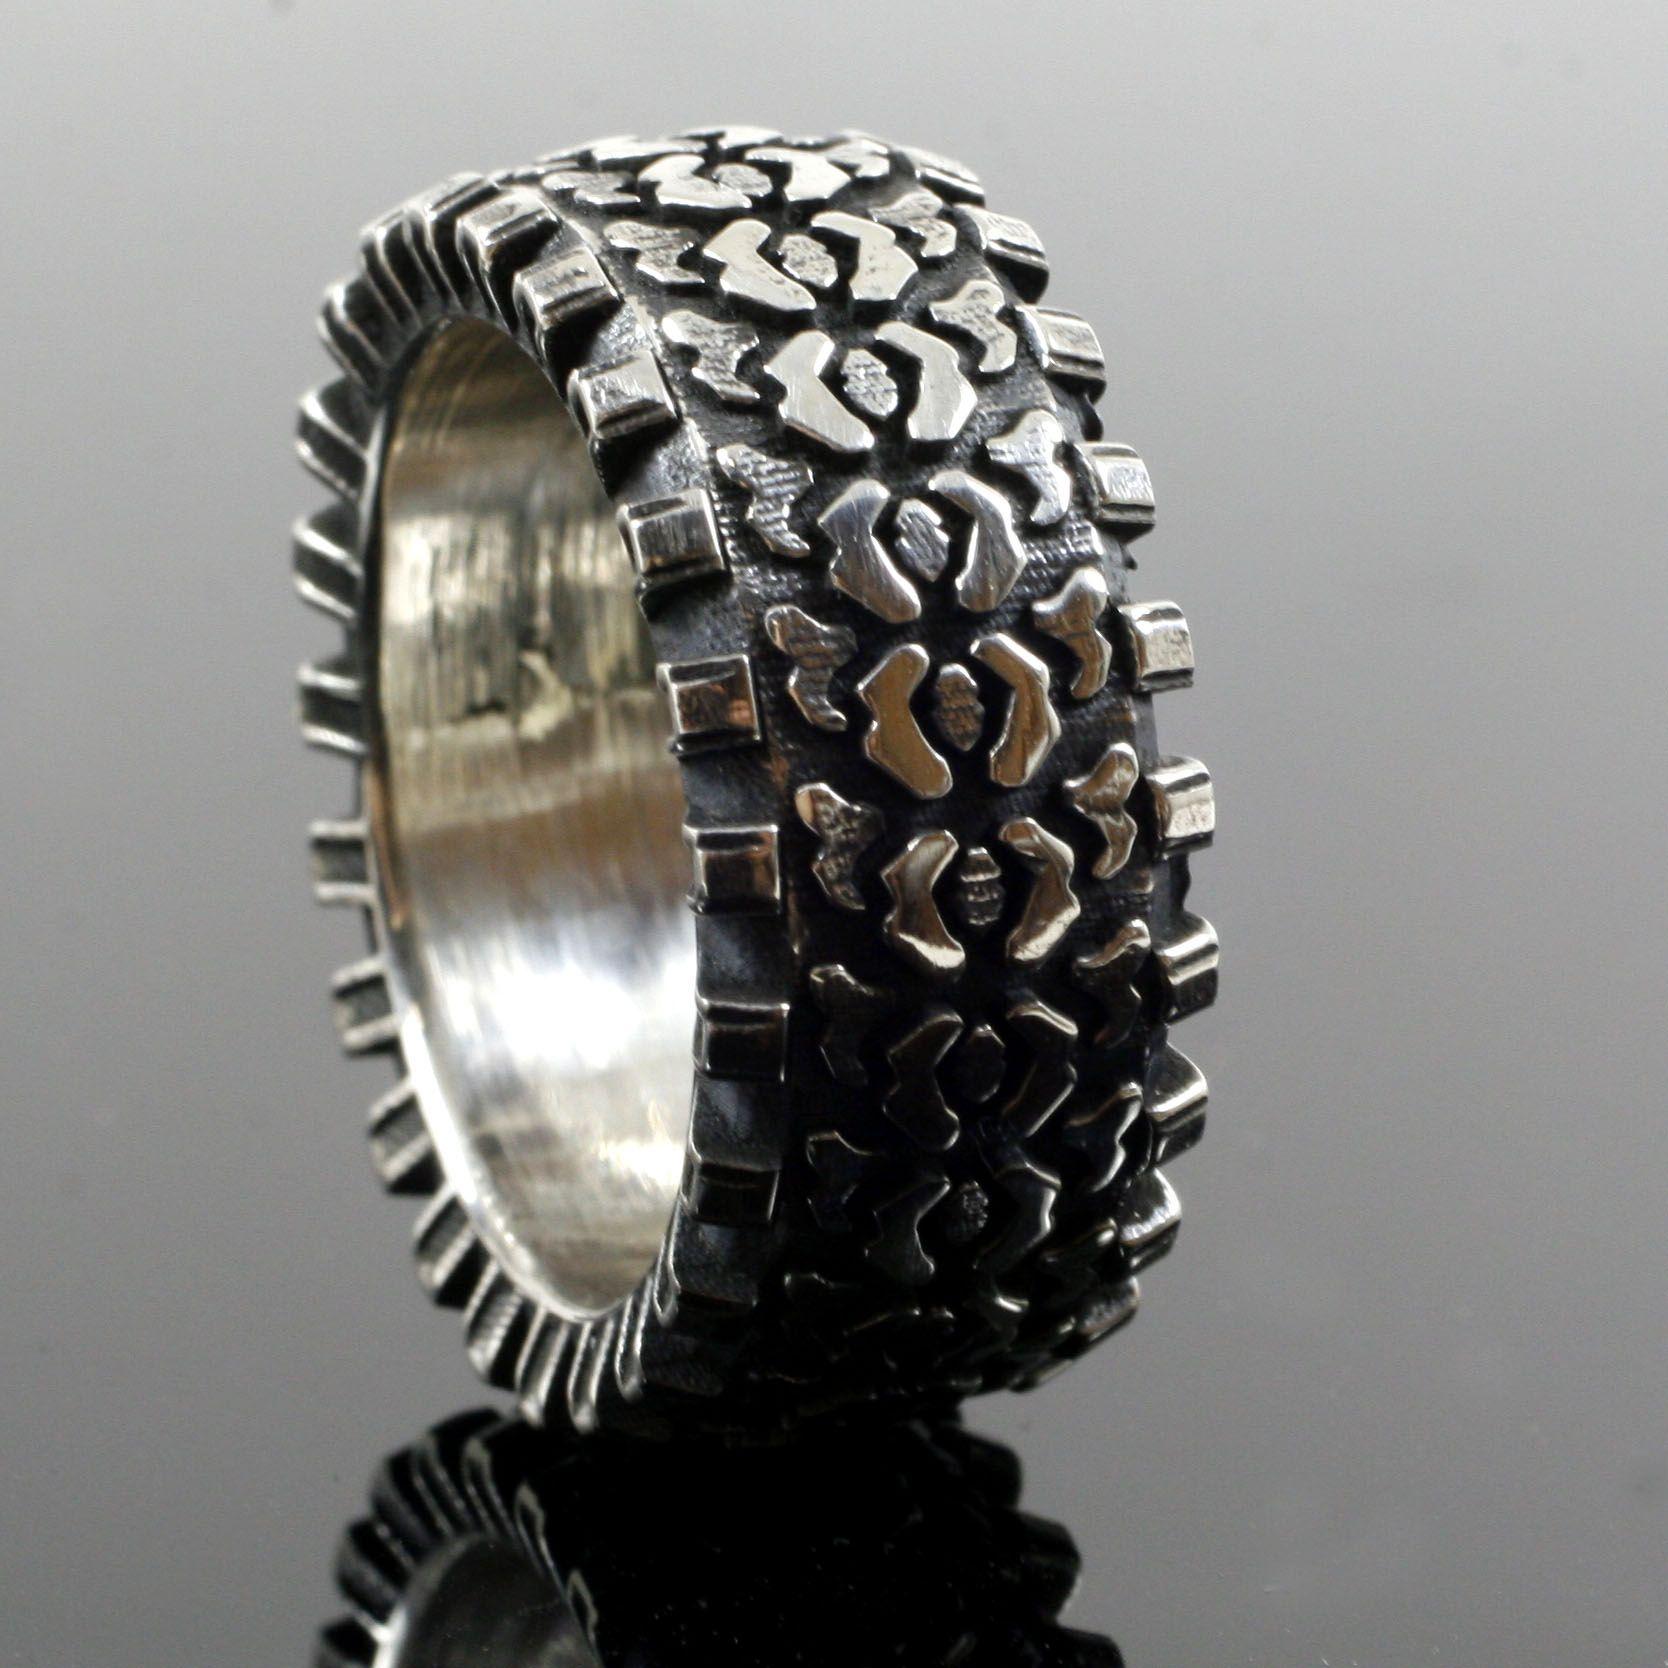 Tire Tread Ring